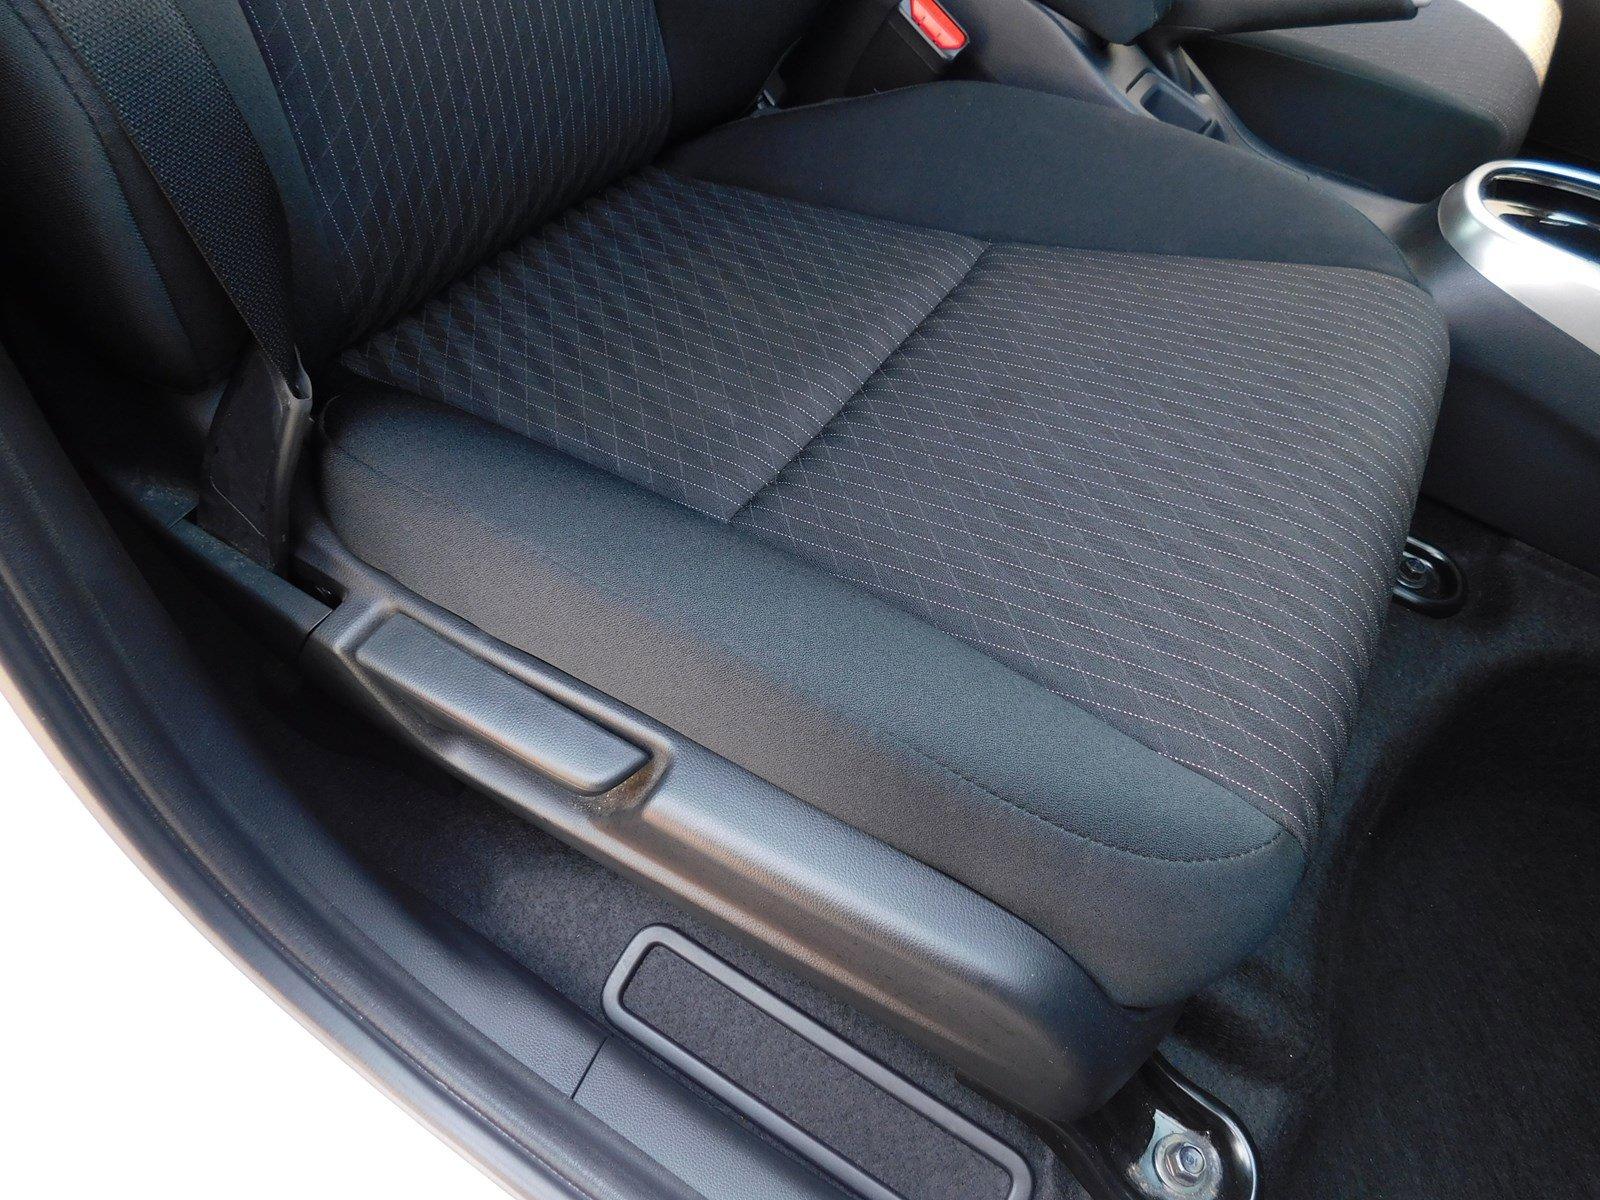 Pre-Owned 2018 Honda Fit EX